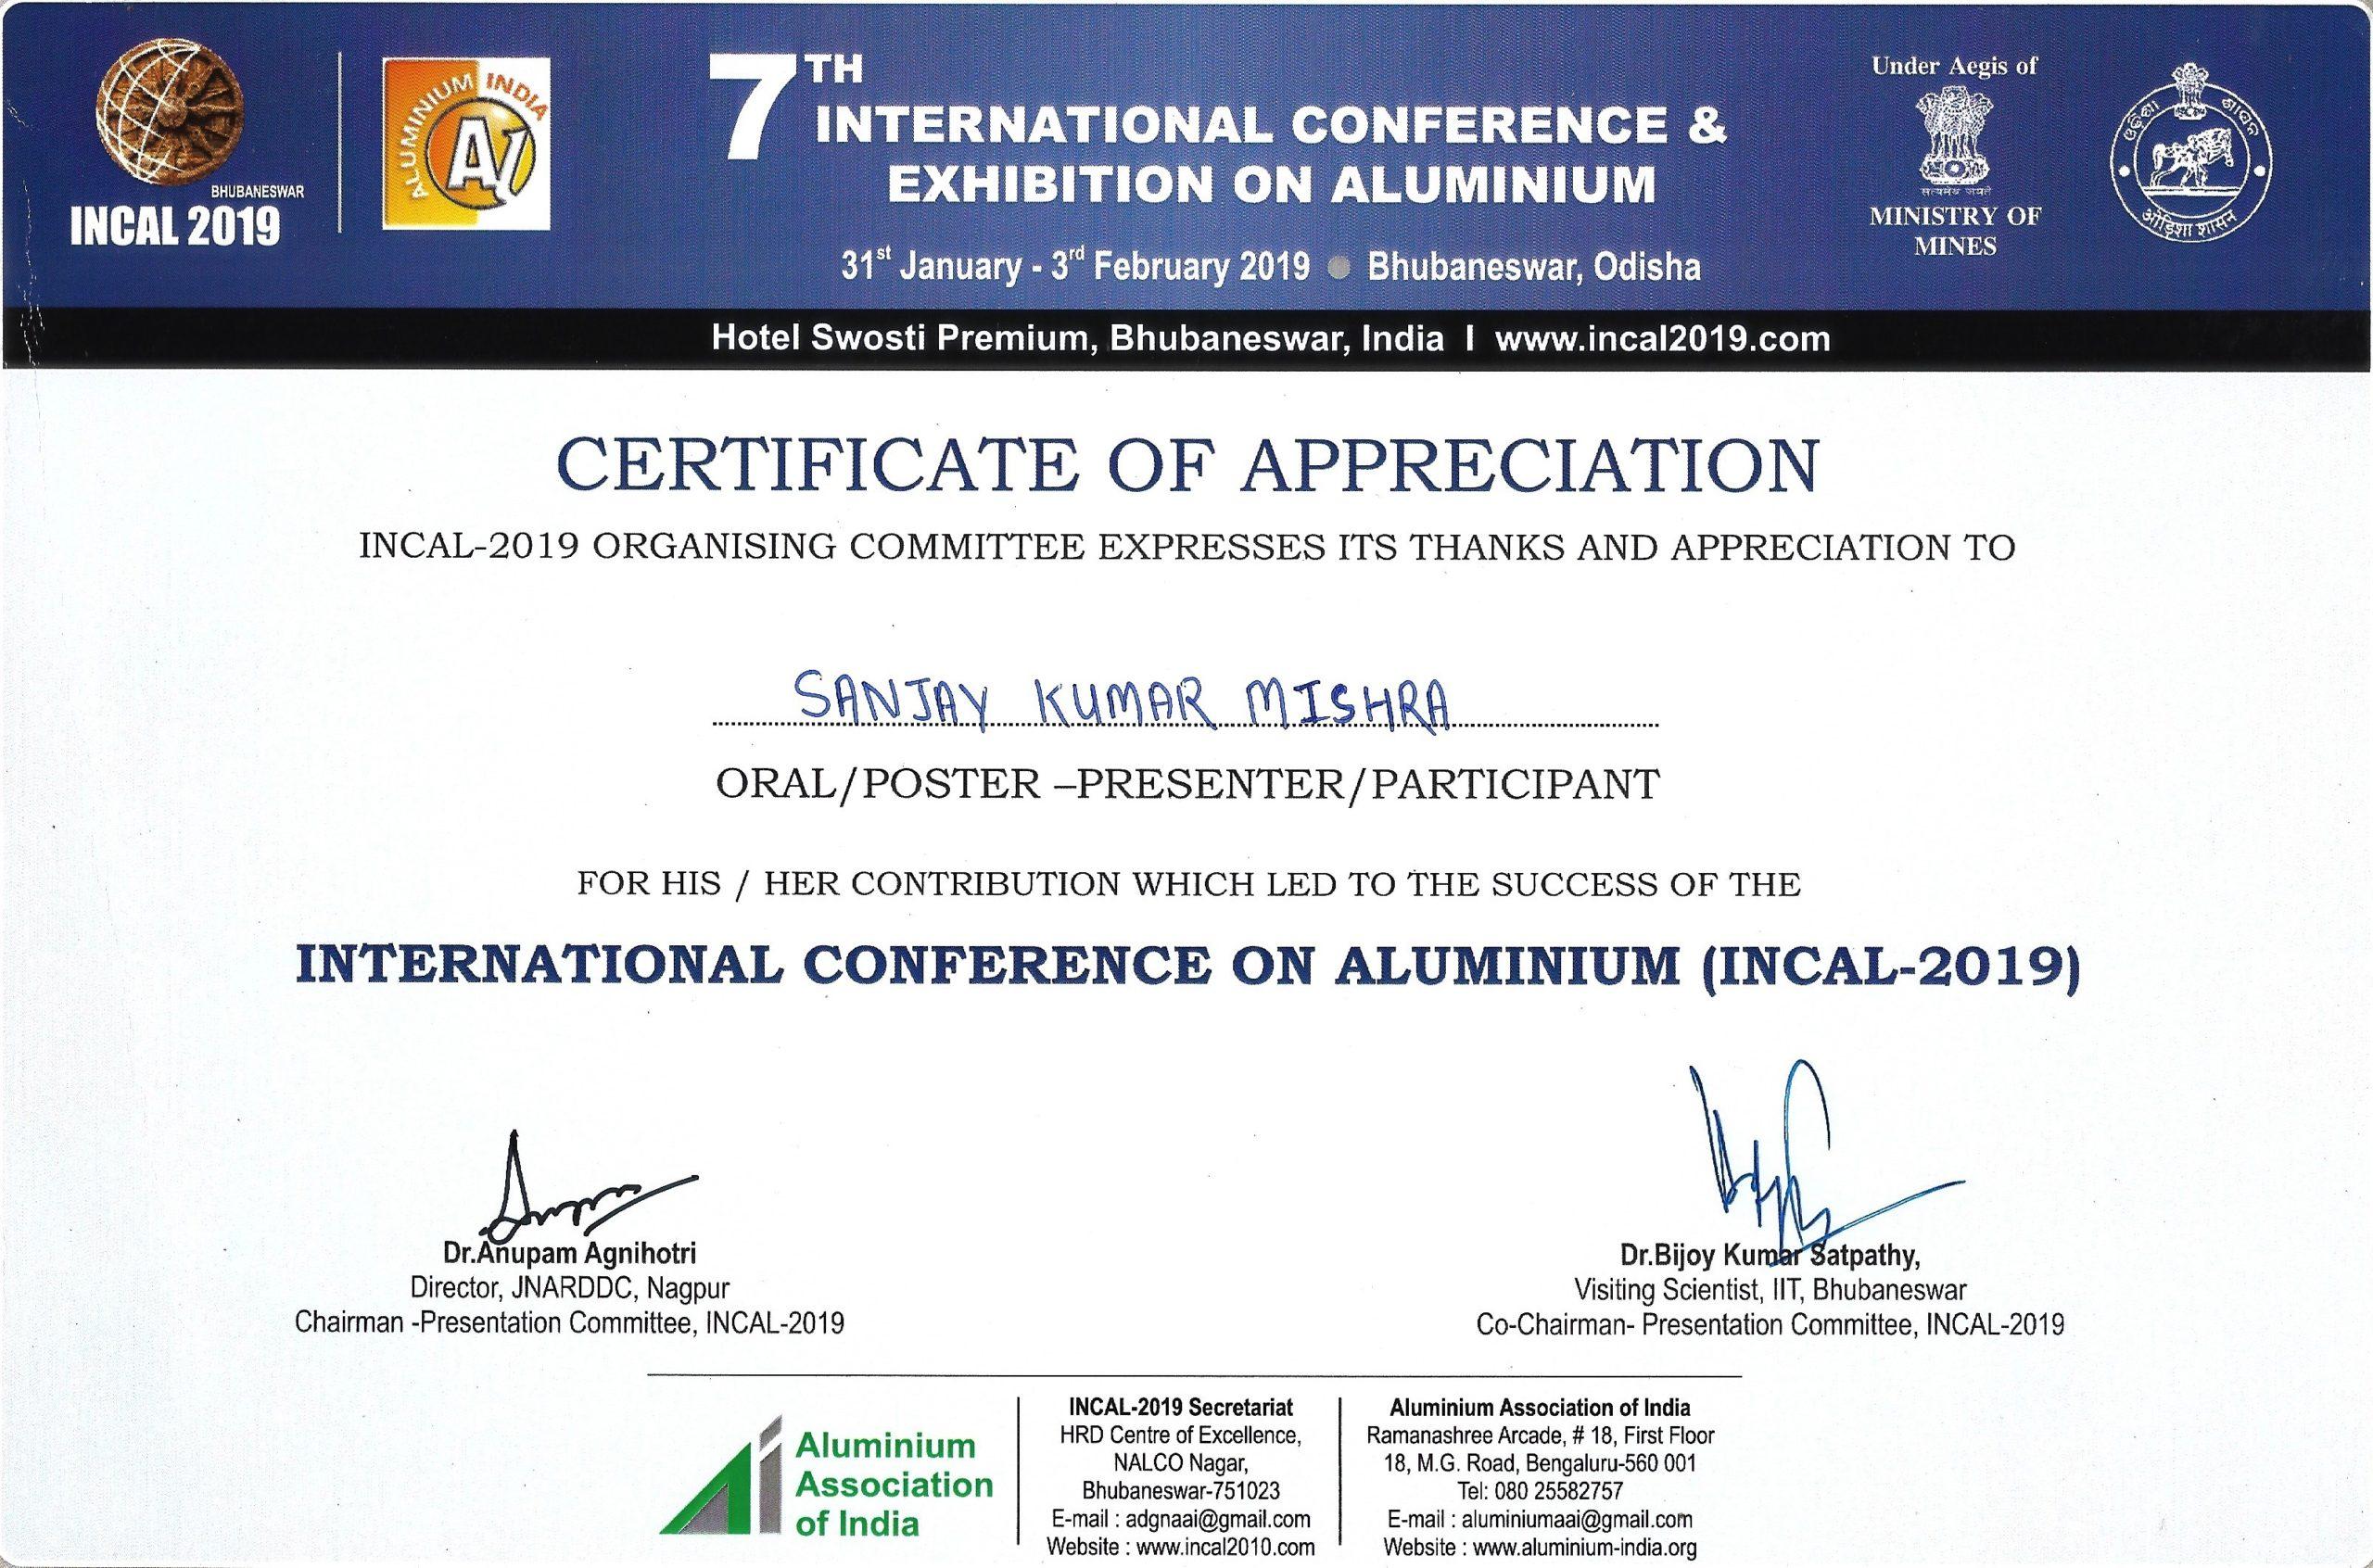 Appreciation by Aluminium Association of India